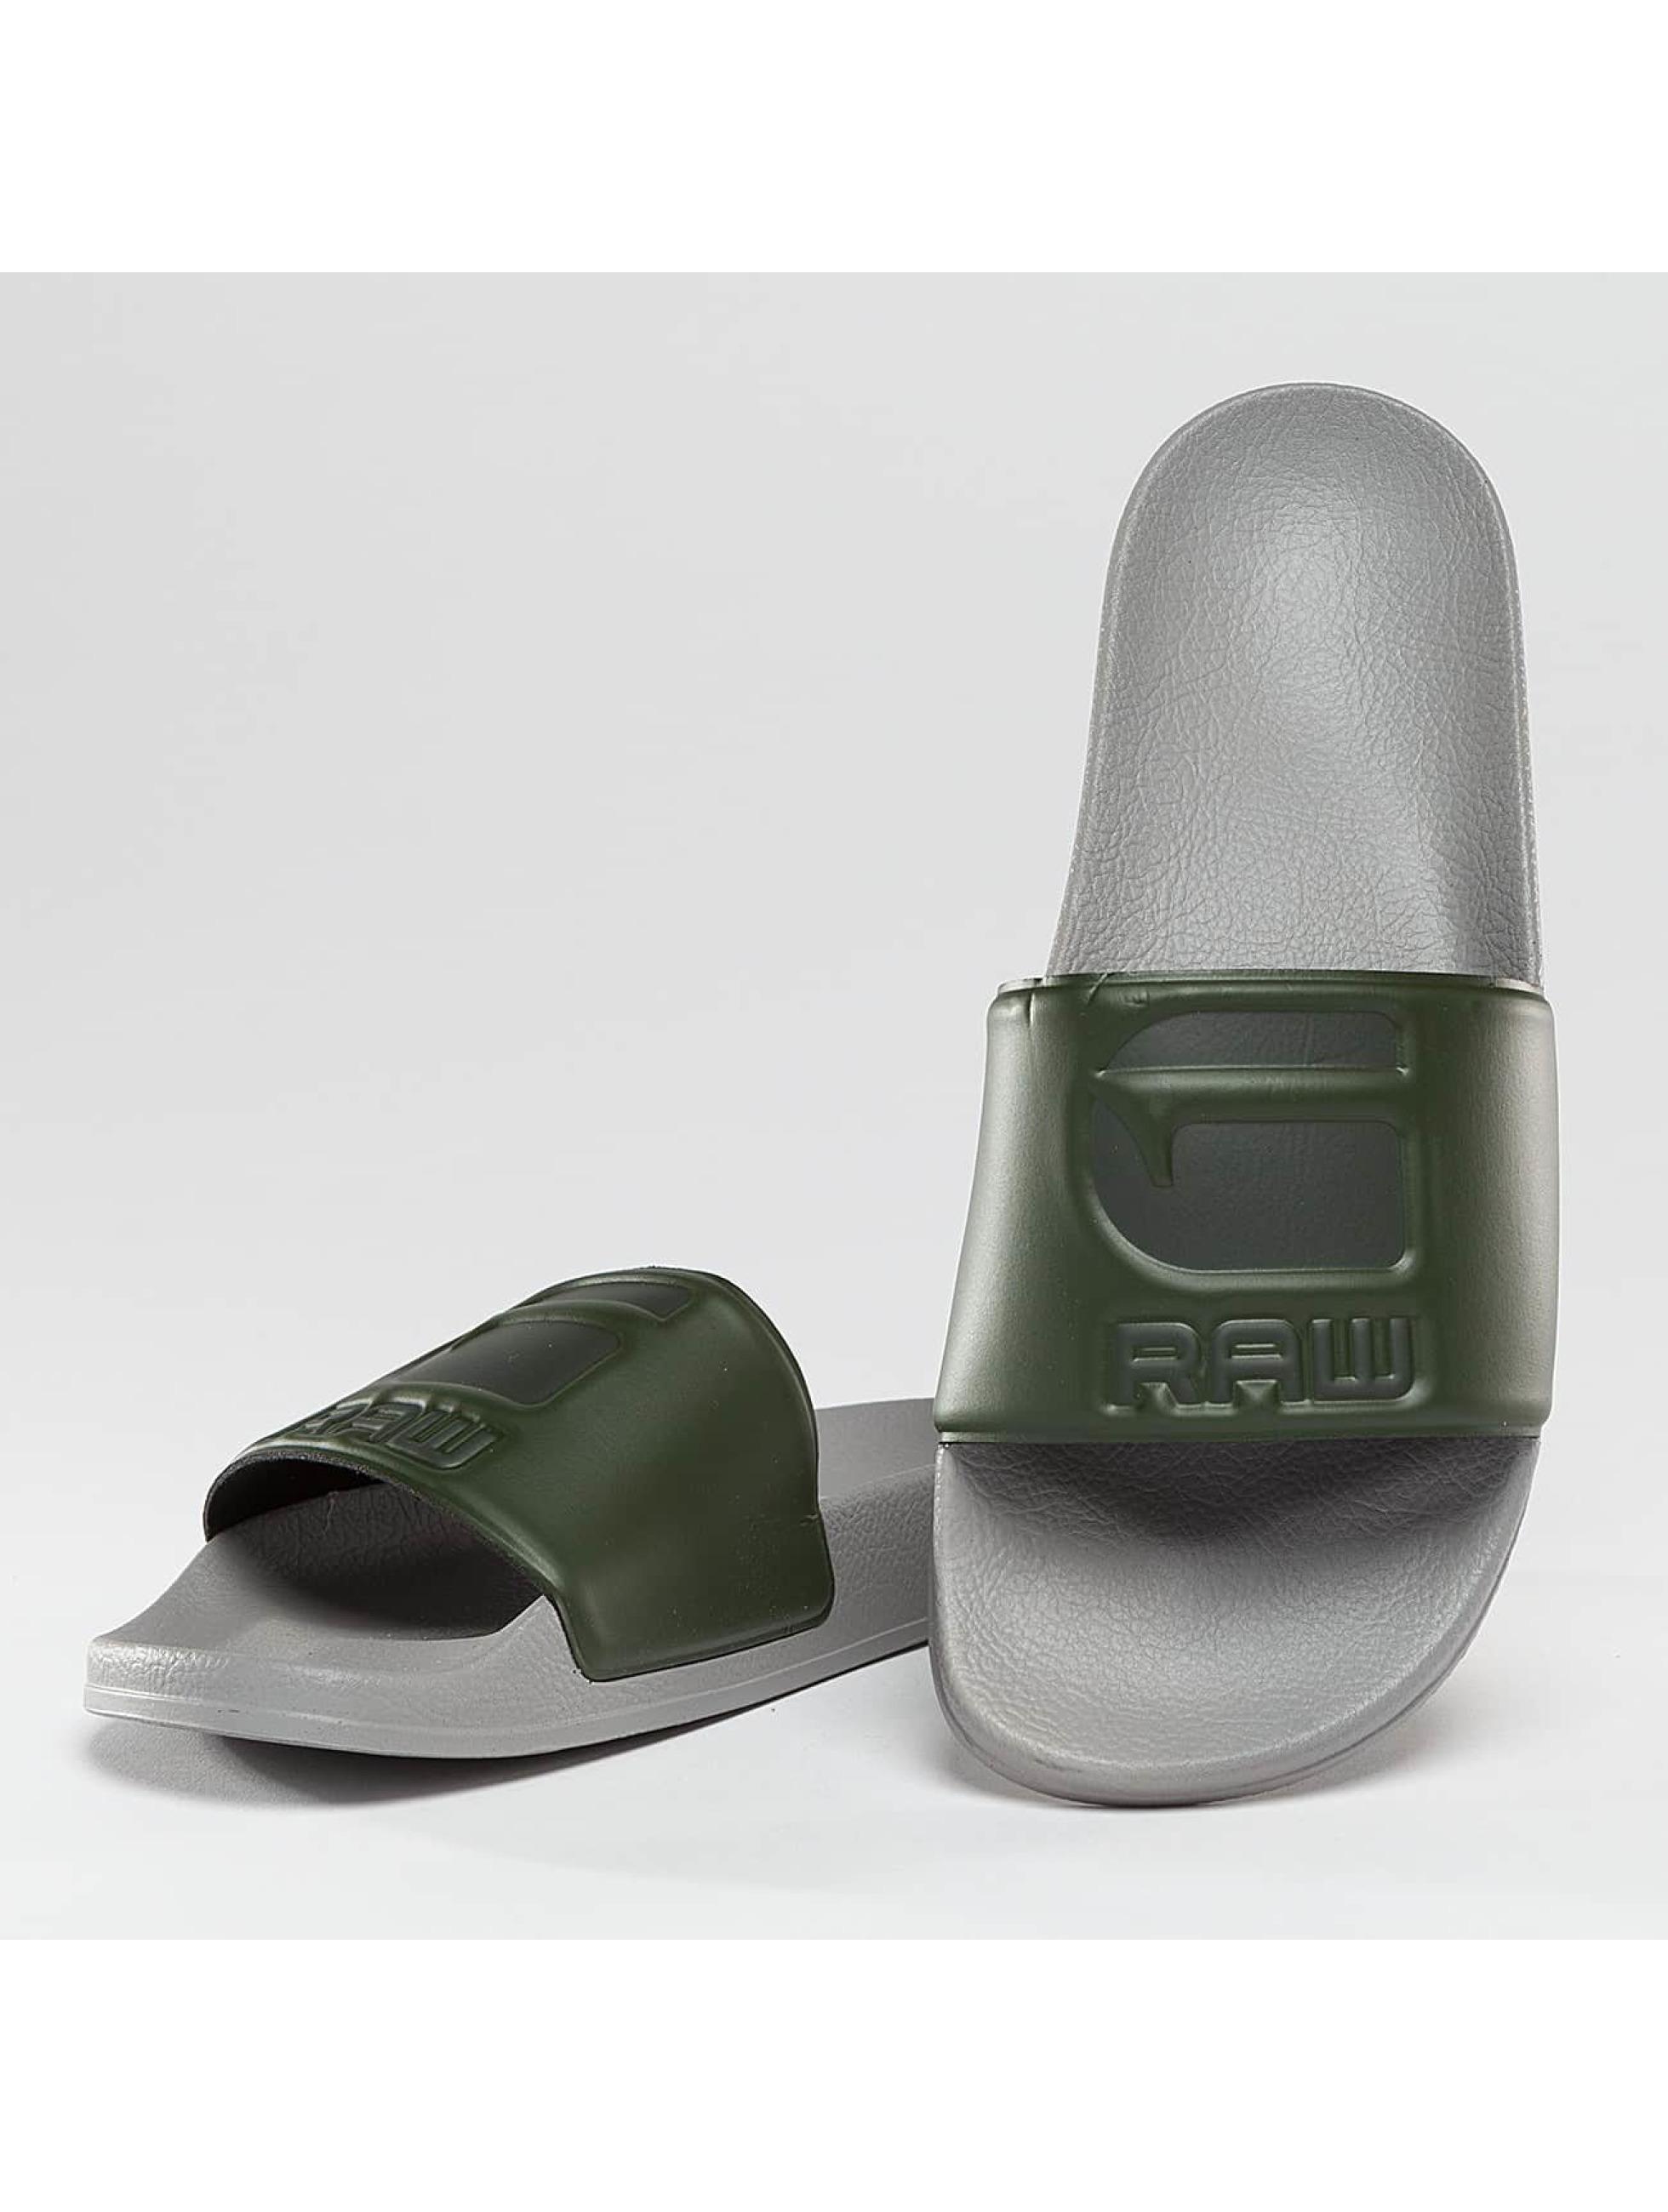 G-Star Chaussures / Sandales Cart Slide en gris